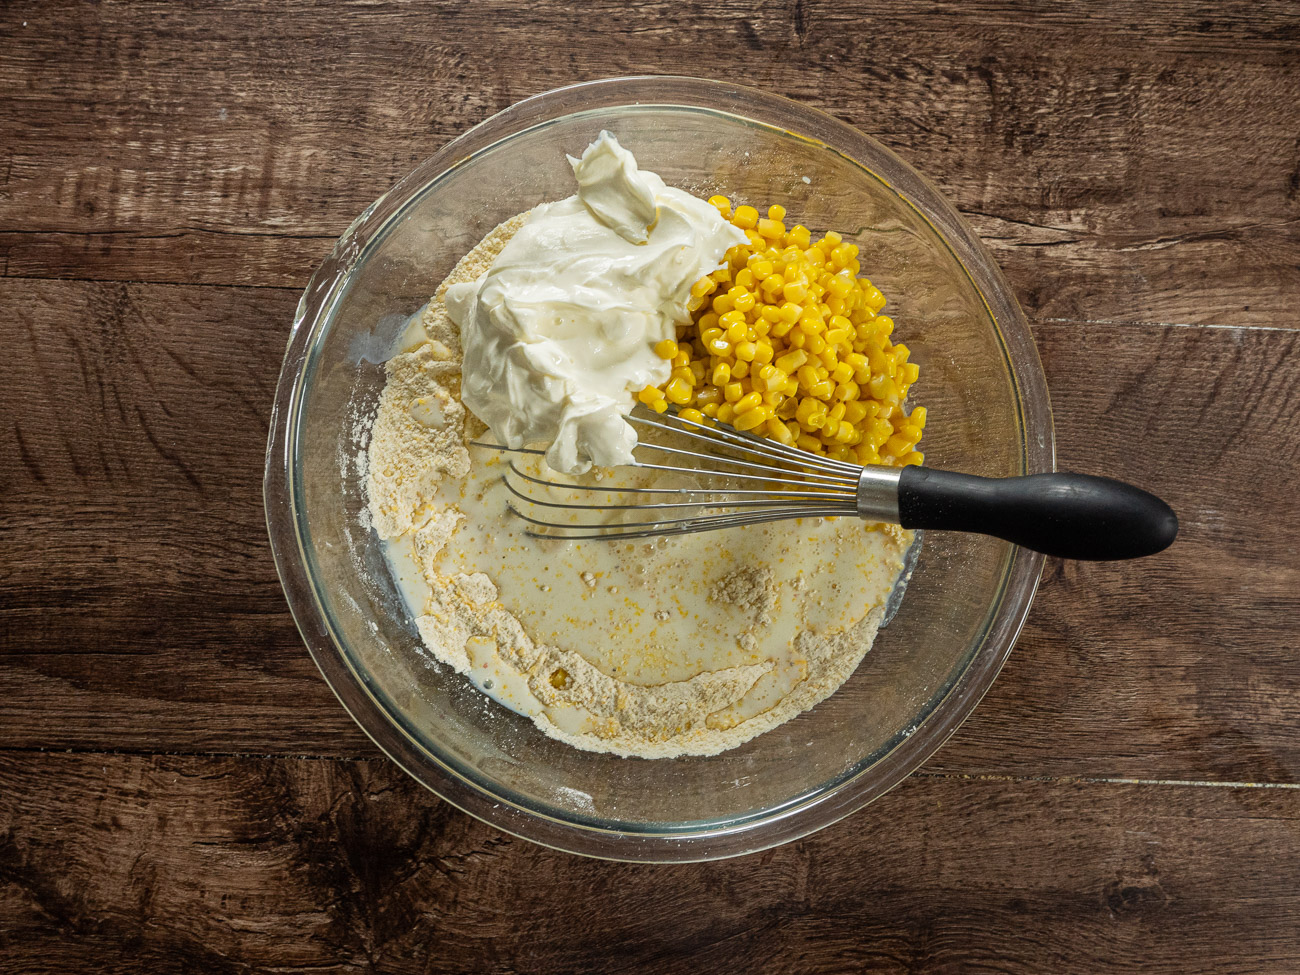 Add corn, sour cream, and milk, and stir to combine.